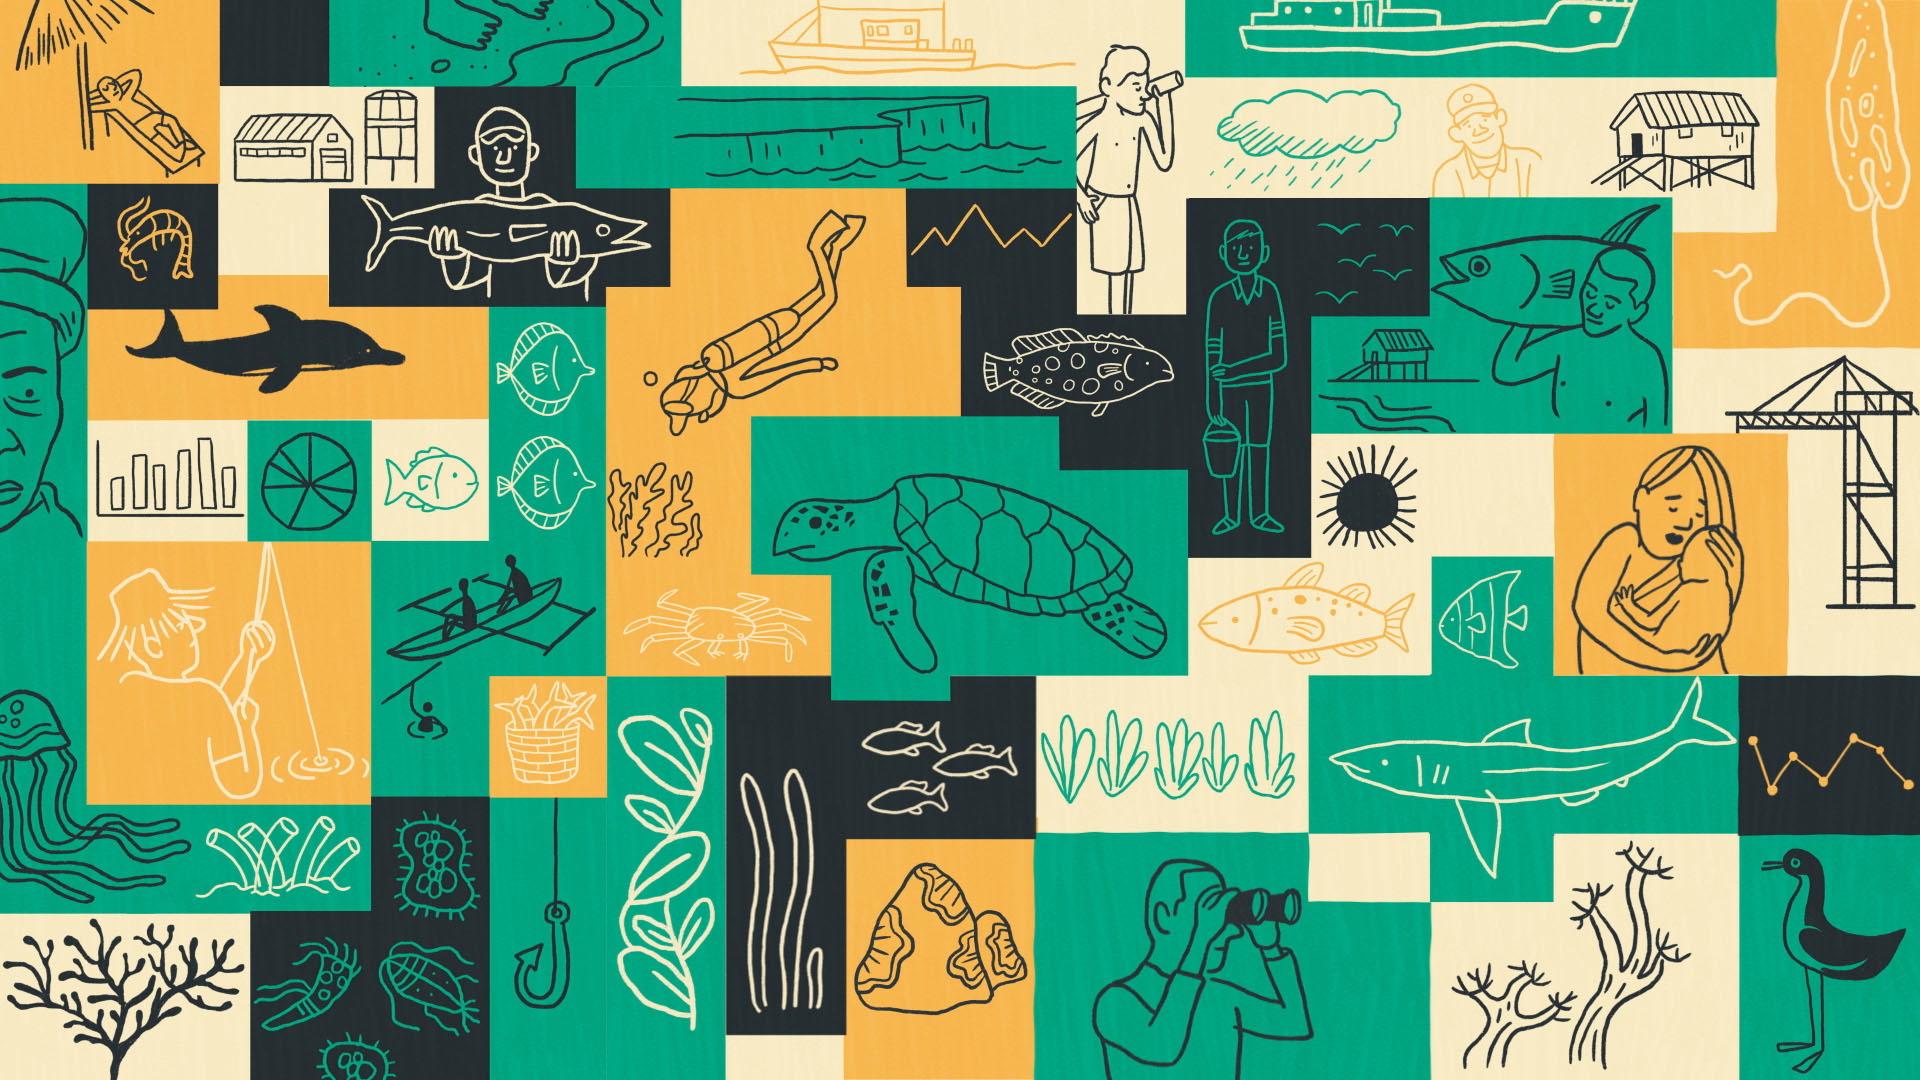 Scriberia Science Communication Visual Storytelling Animation Oxford Sparks